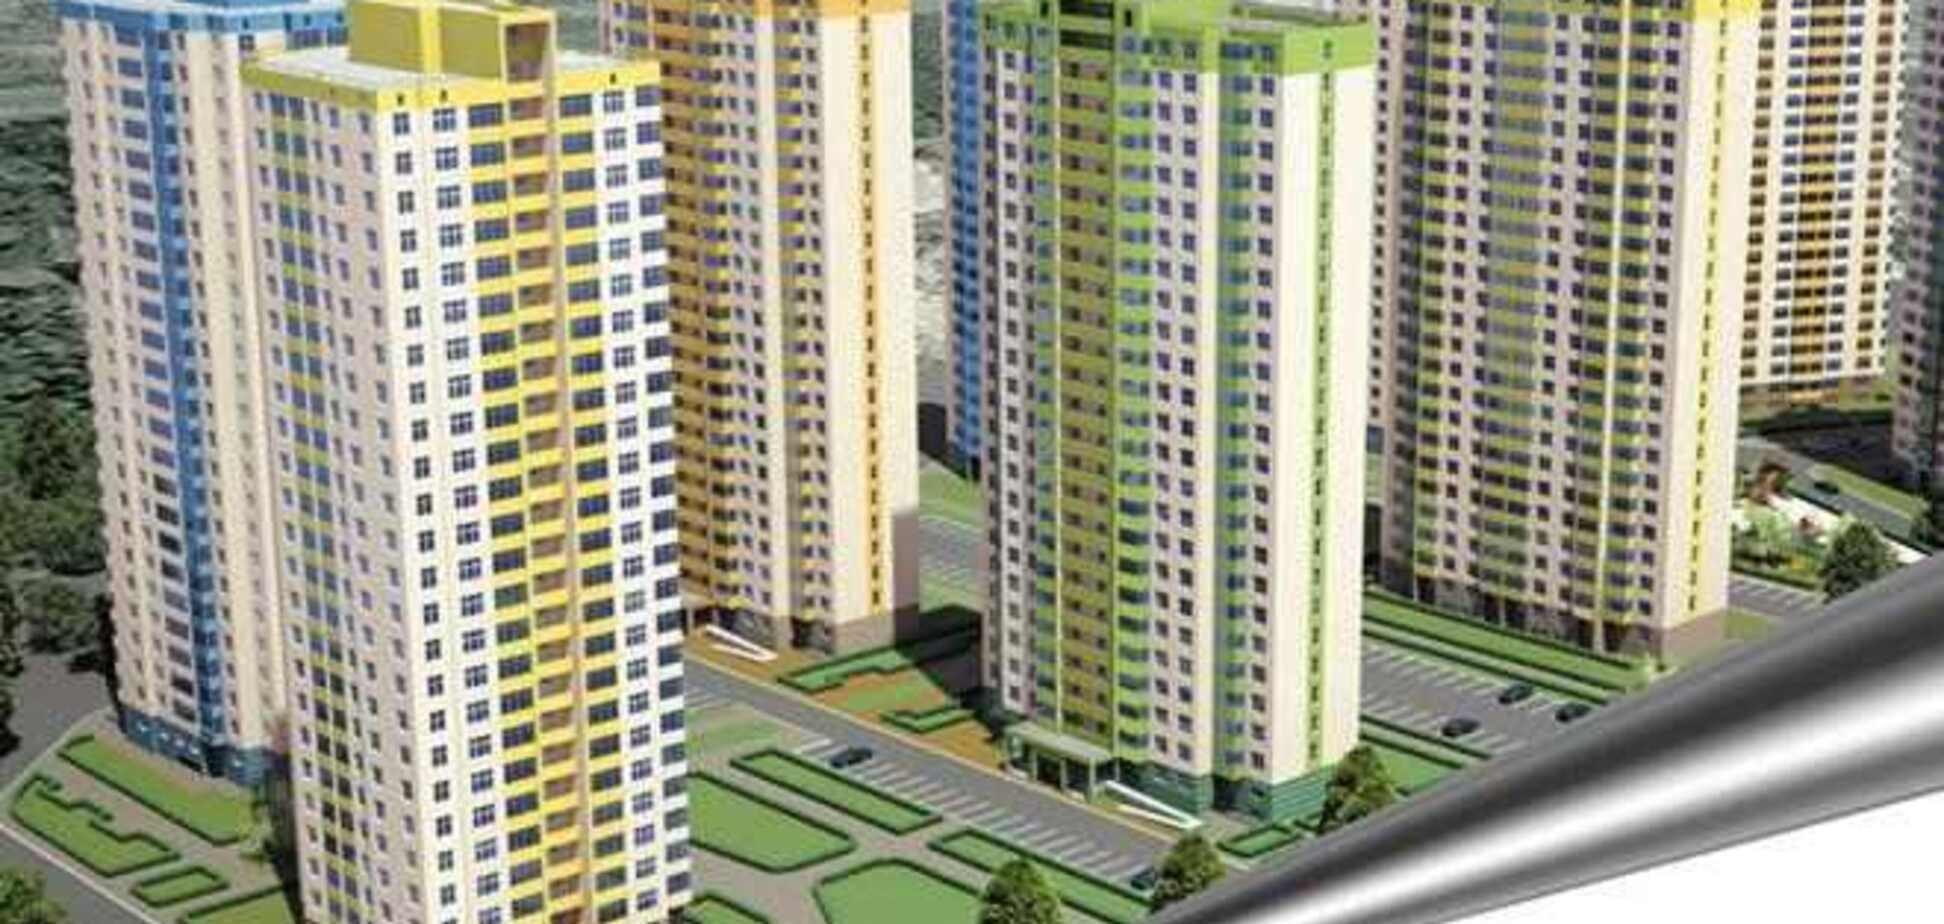 Стартовала продажа квартир в ІІІ очереди ЖК 'Парковые озера'